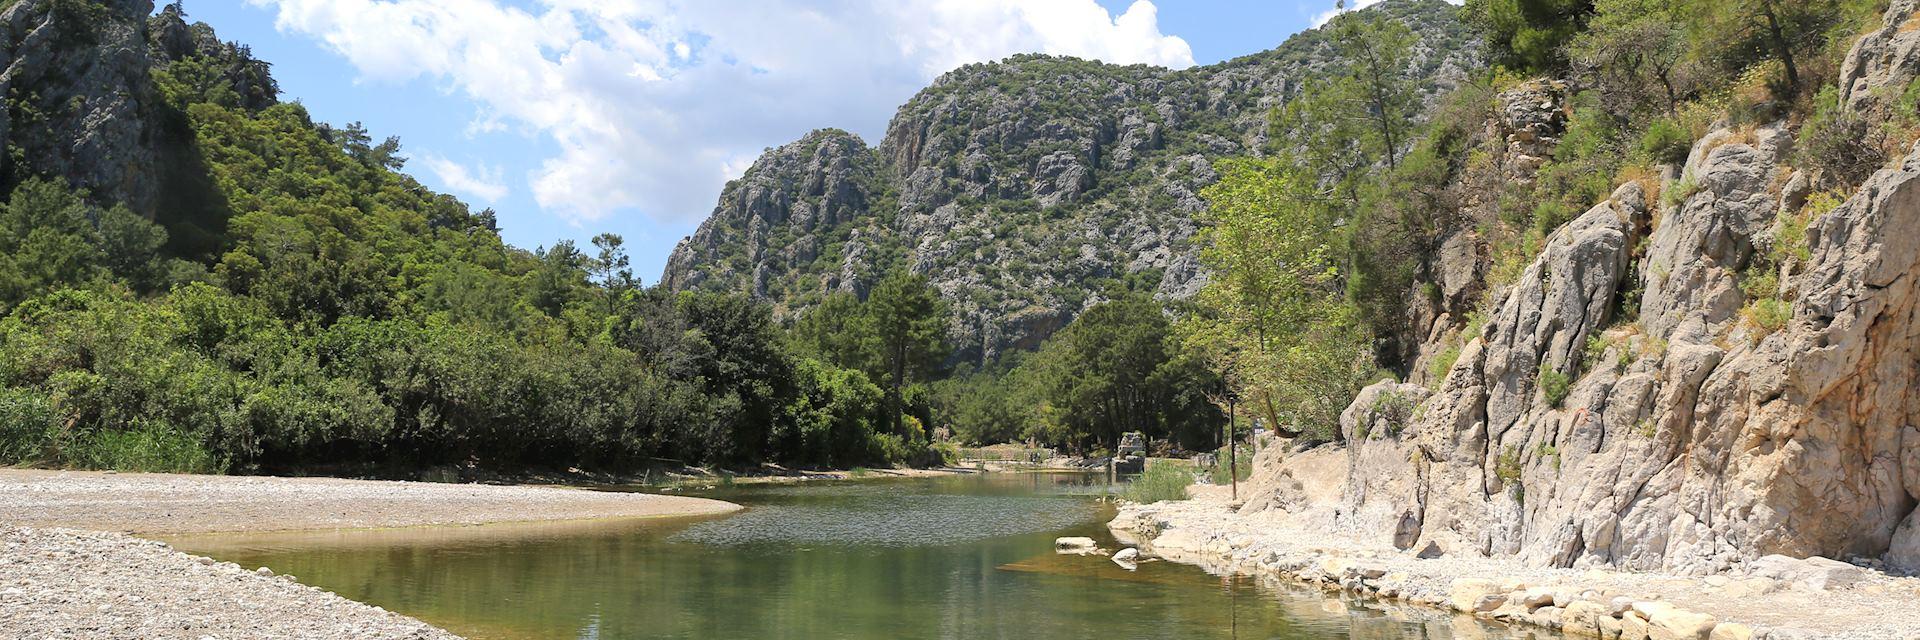 Çirali countryside